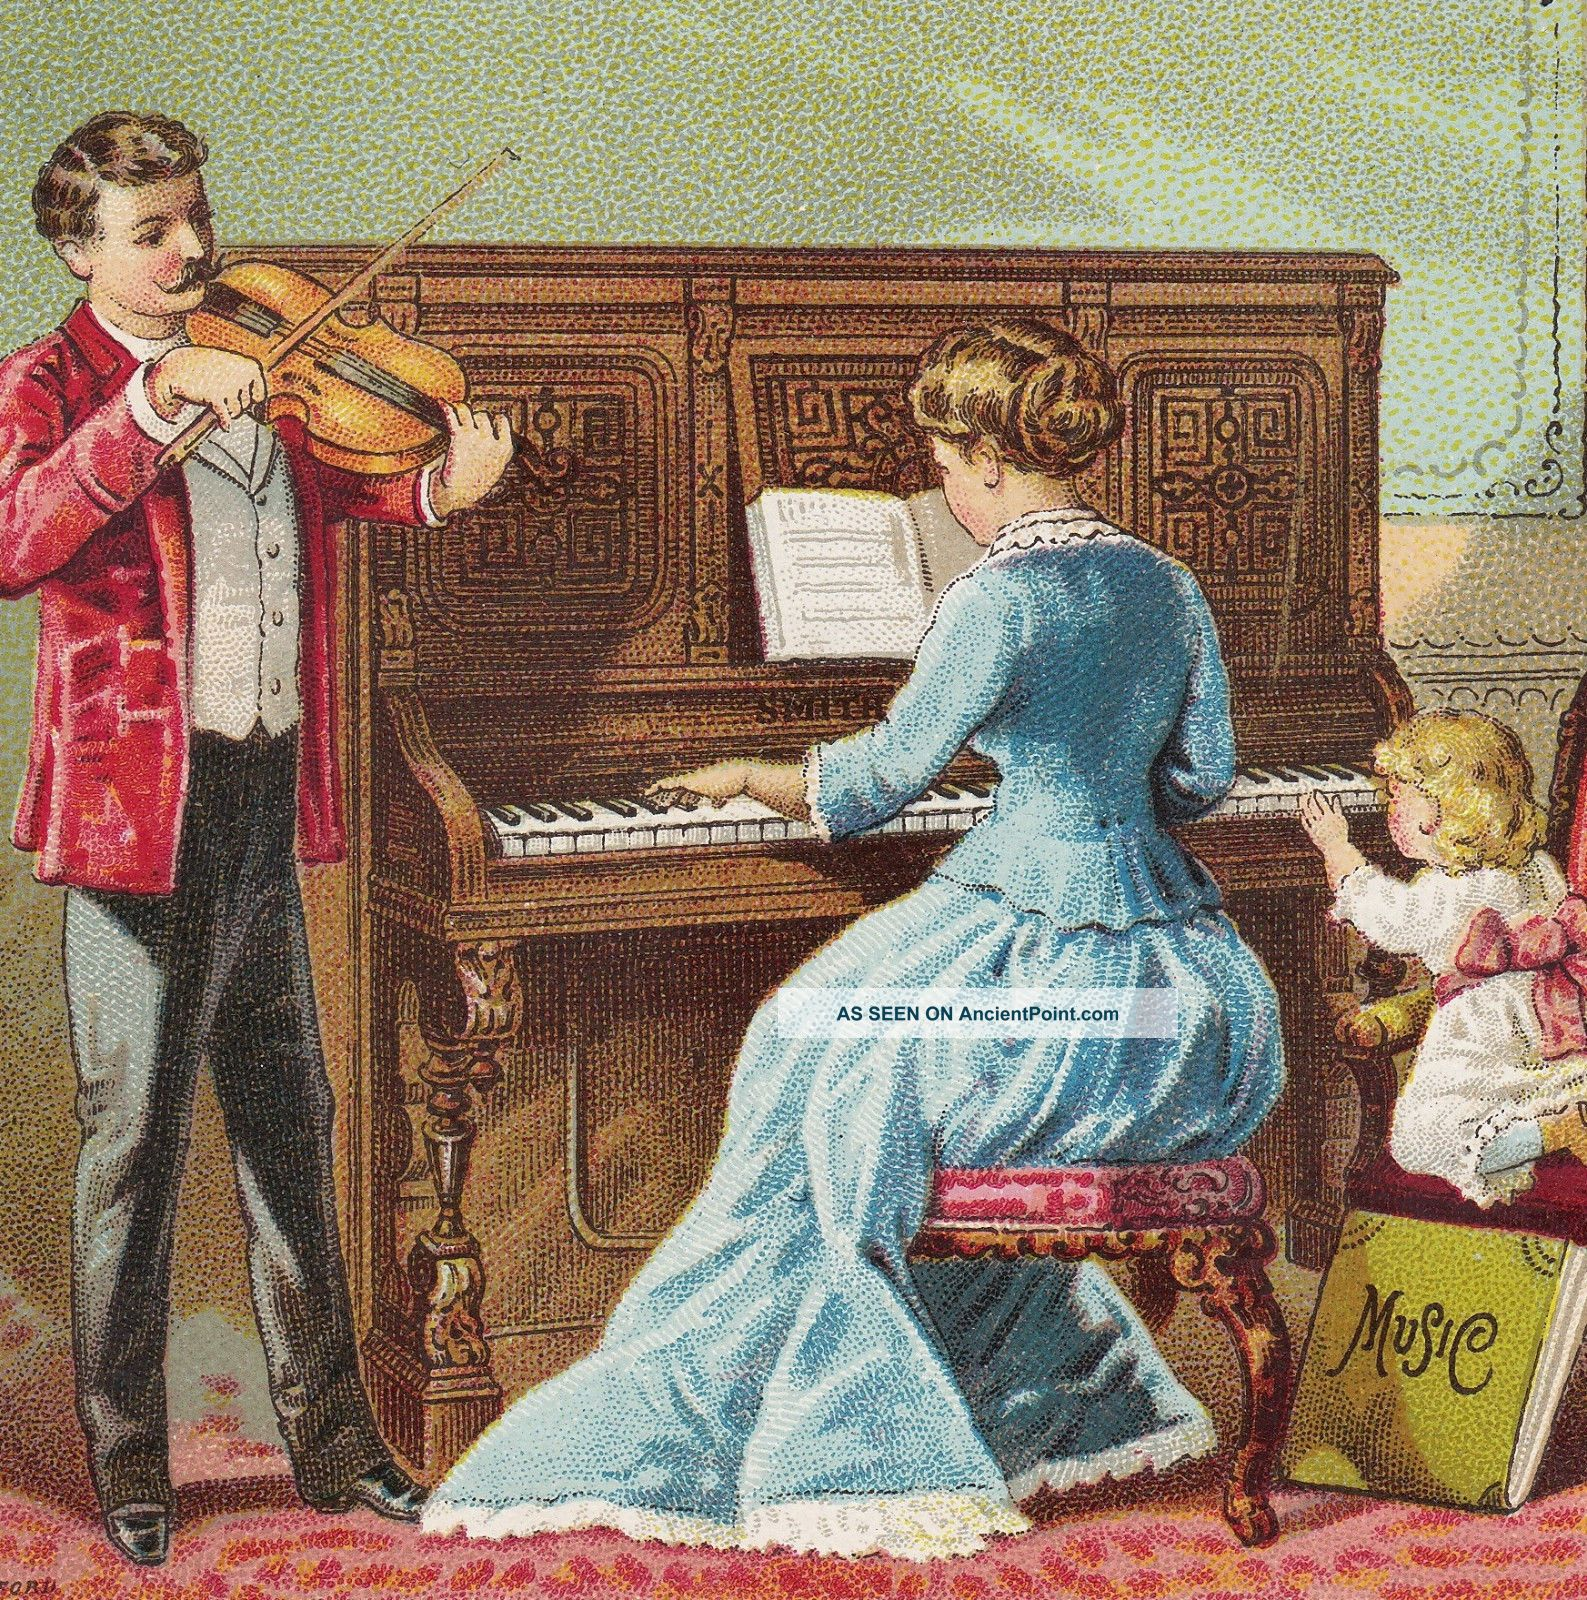 Smith American Organ & Piano Boston Kendrick Trenton Nj Advertising Trade Card Keyboard photo